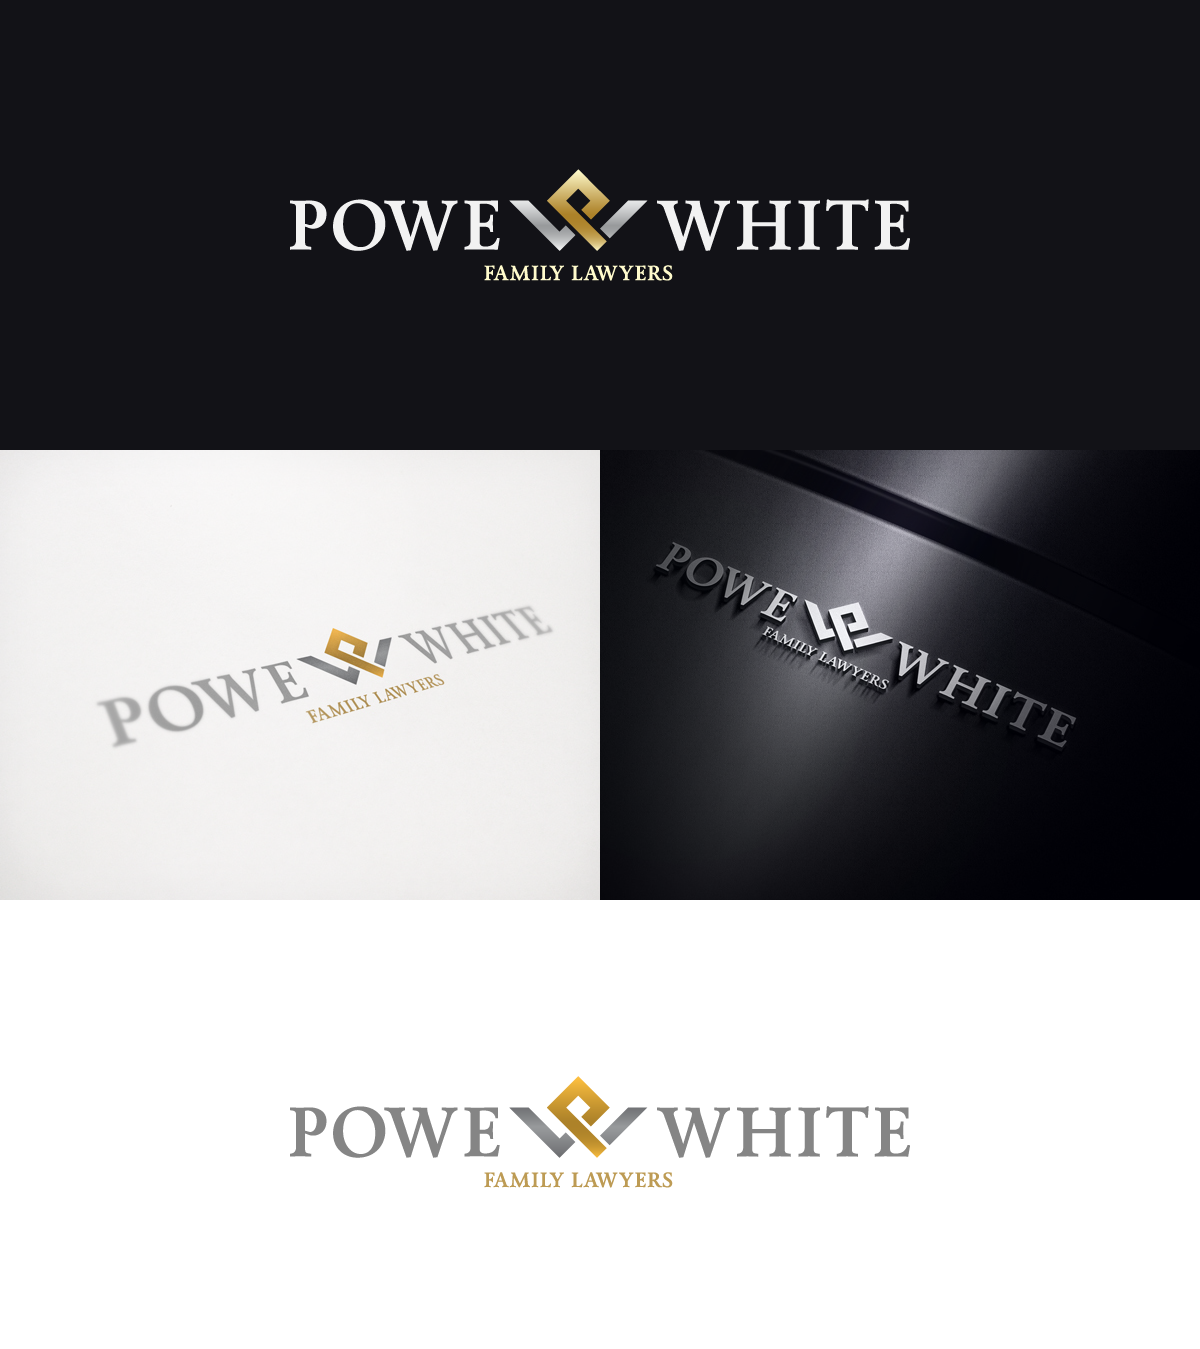 logo for Powe & White Family Lawyers